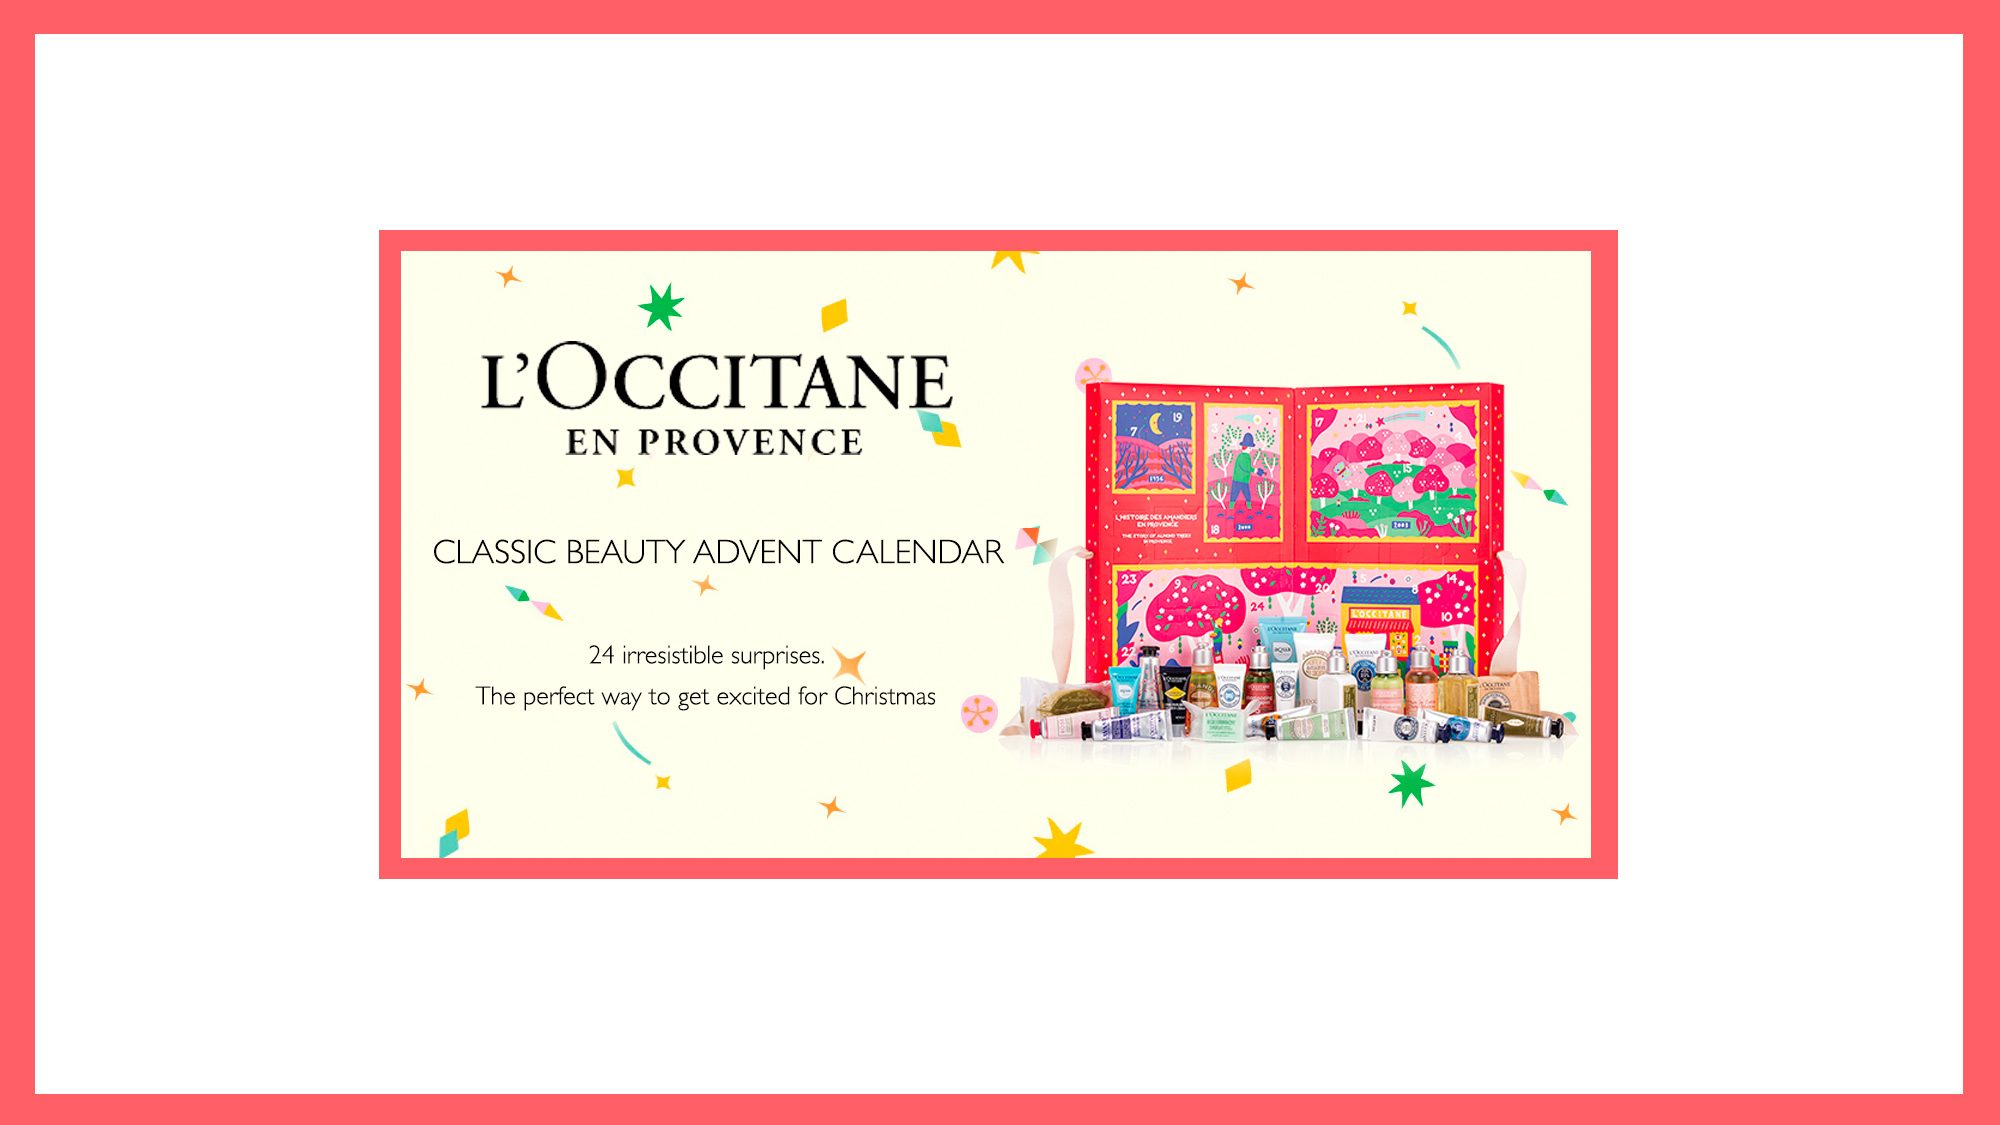 L'Occitane - Classic Beauty Advent Calendar